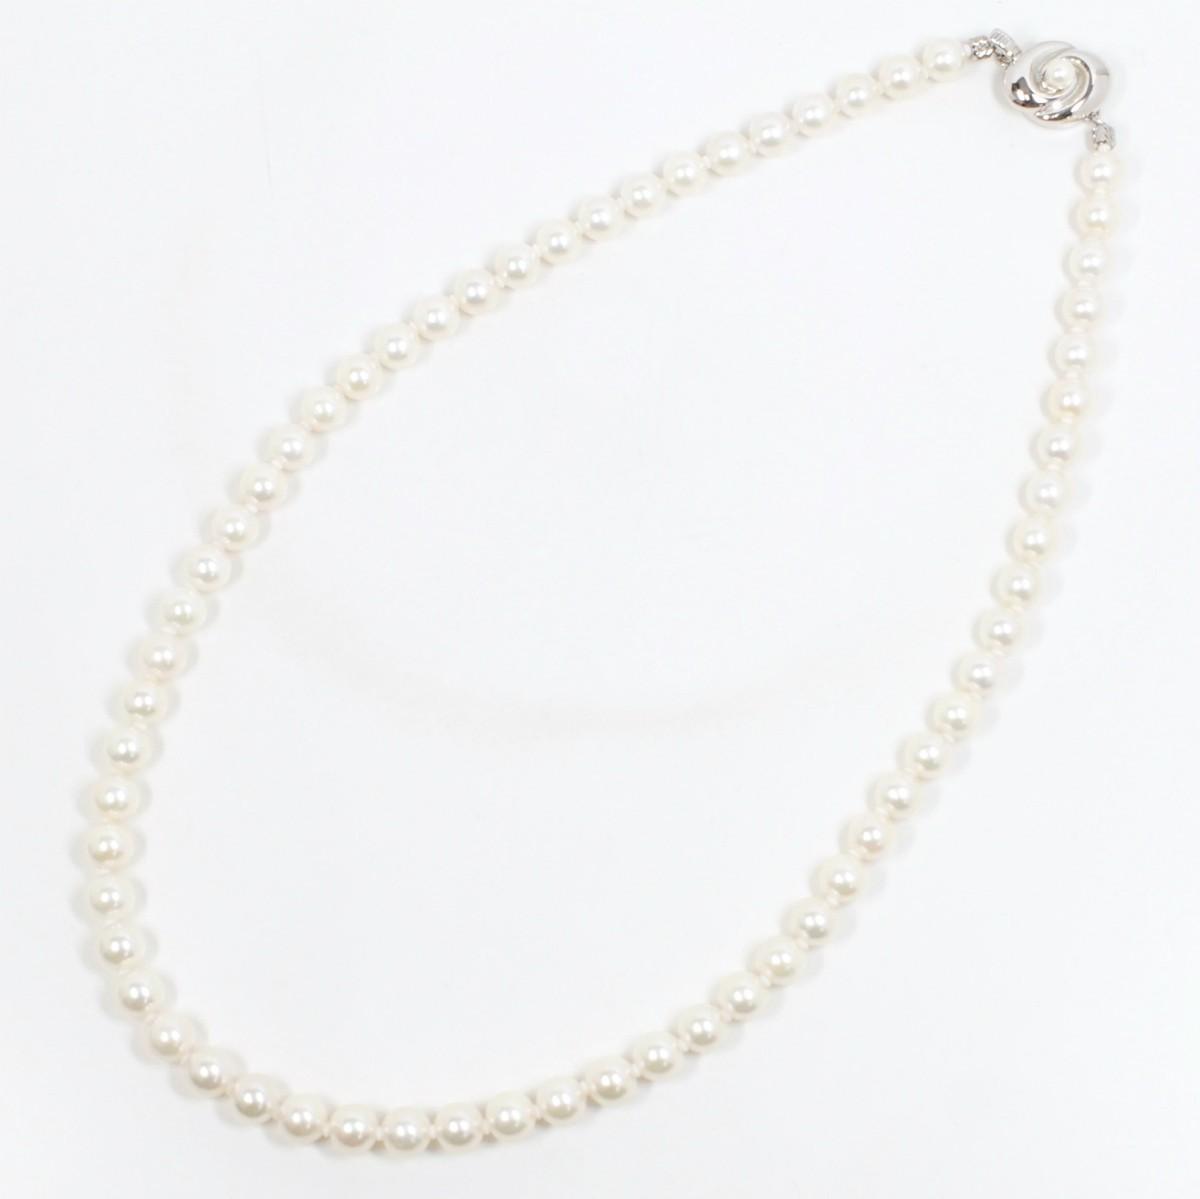 CITIZEN シチズン あこや真珠 6.5~7ミリ パール ネックレス 上質・美品_画像3